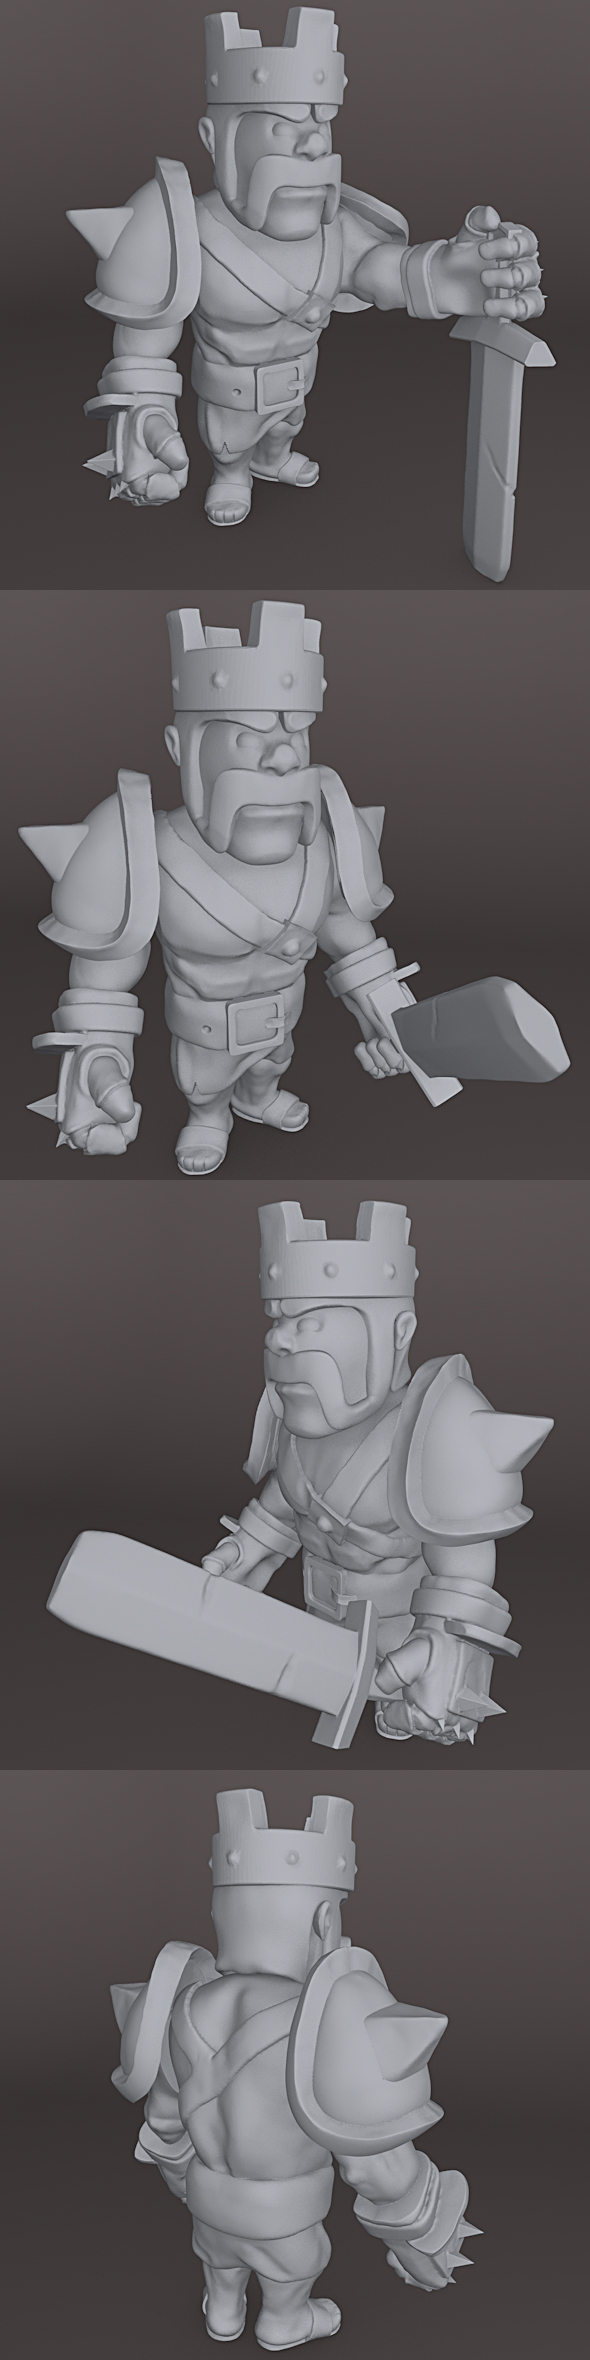 3DOcean Barbarian King Clash of Clans 3D PRINTER 19442828